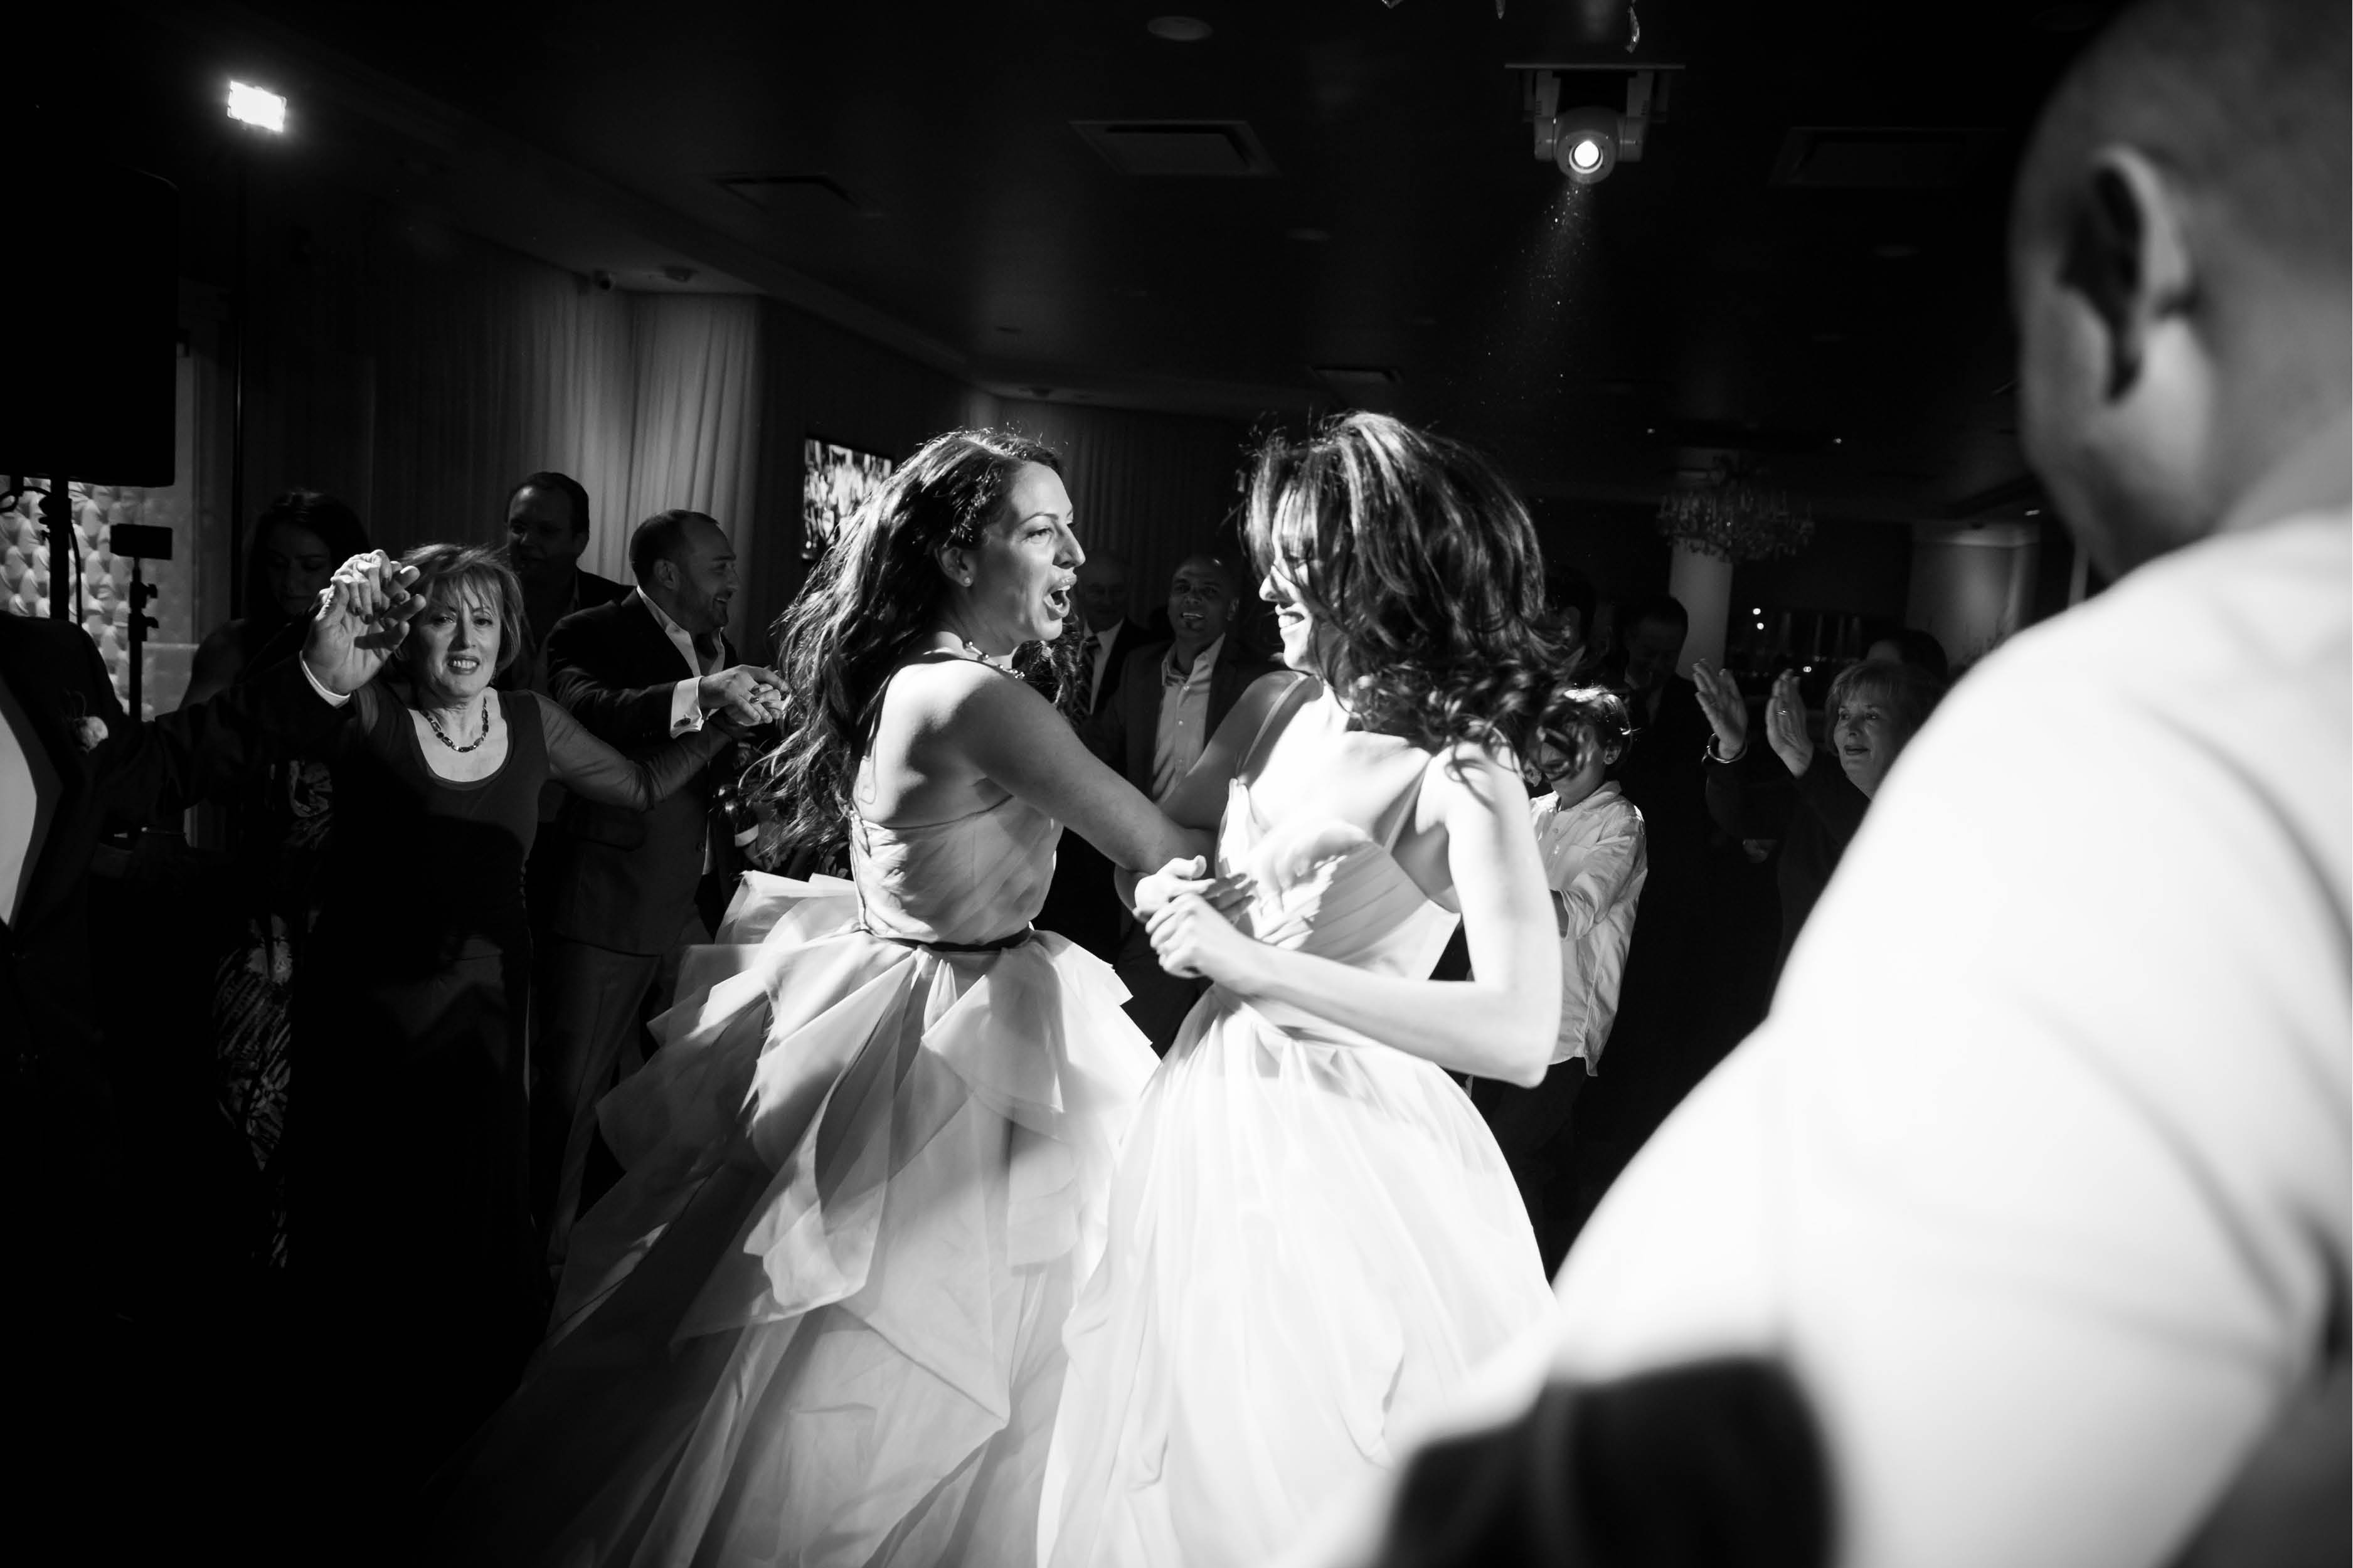 Emma_cleary_ photography_Waterside NJ wedding18